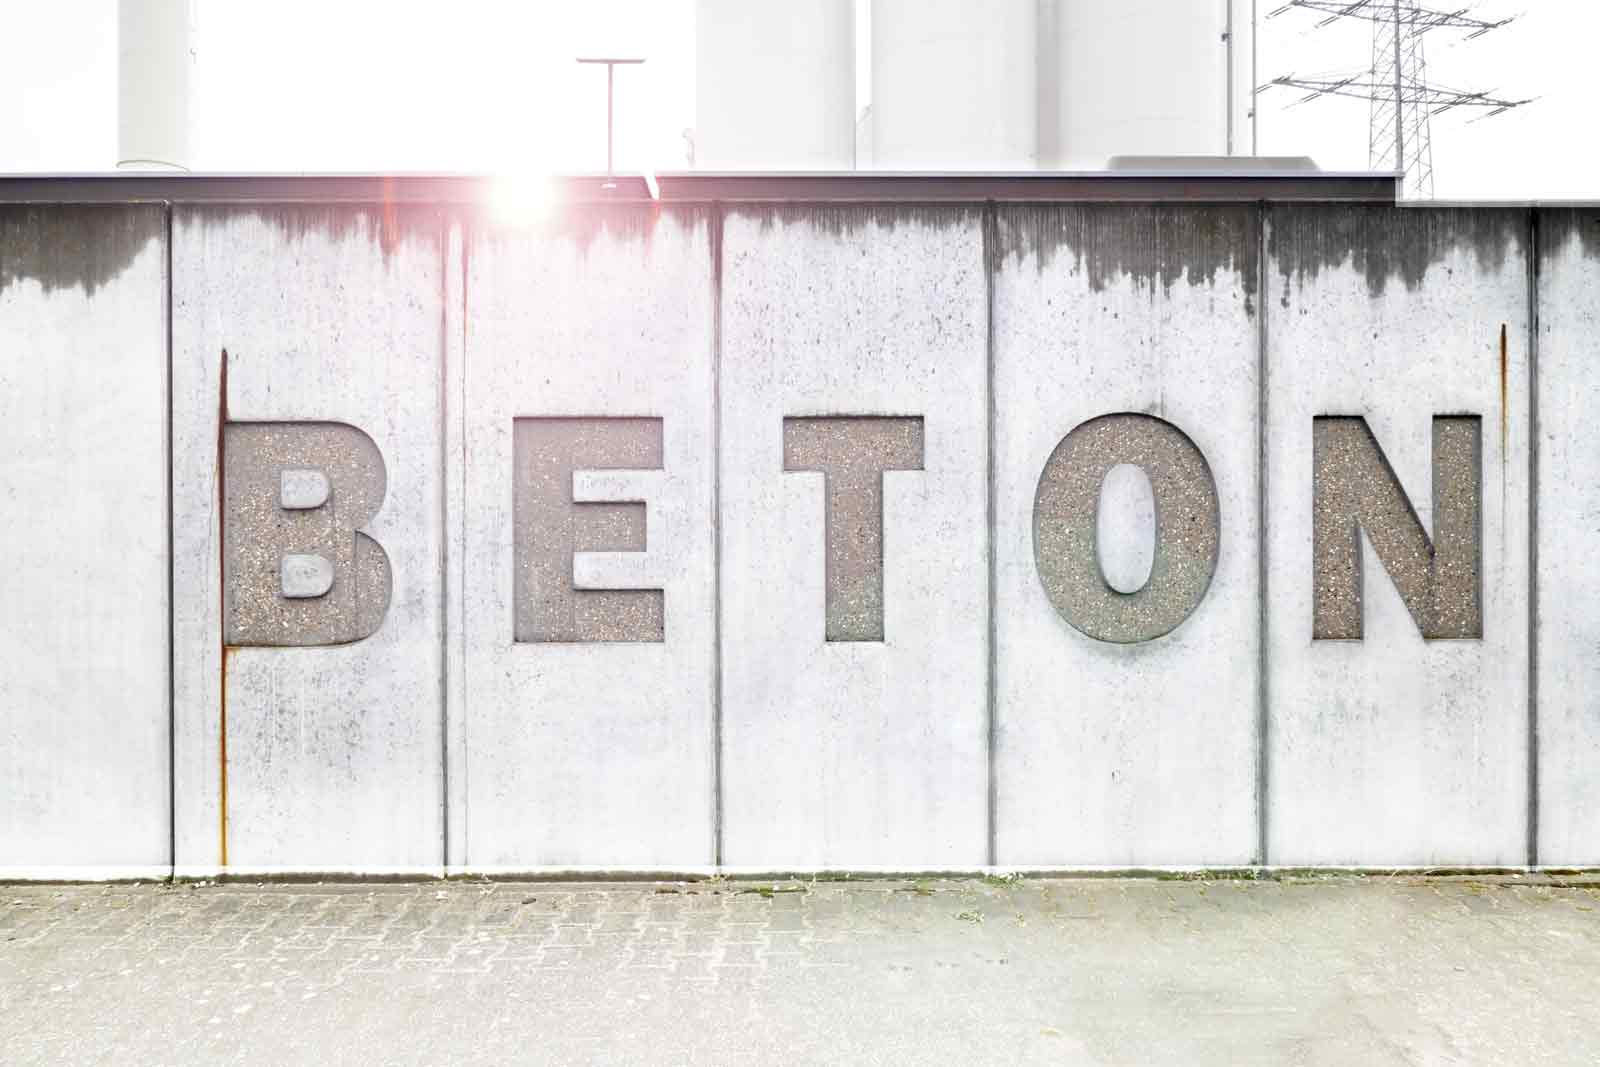 Beton Font in Beton by Martin Blum